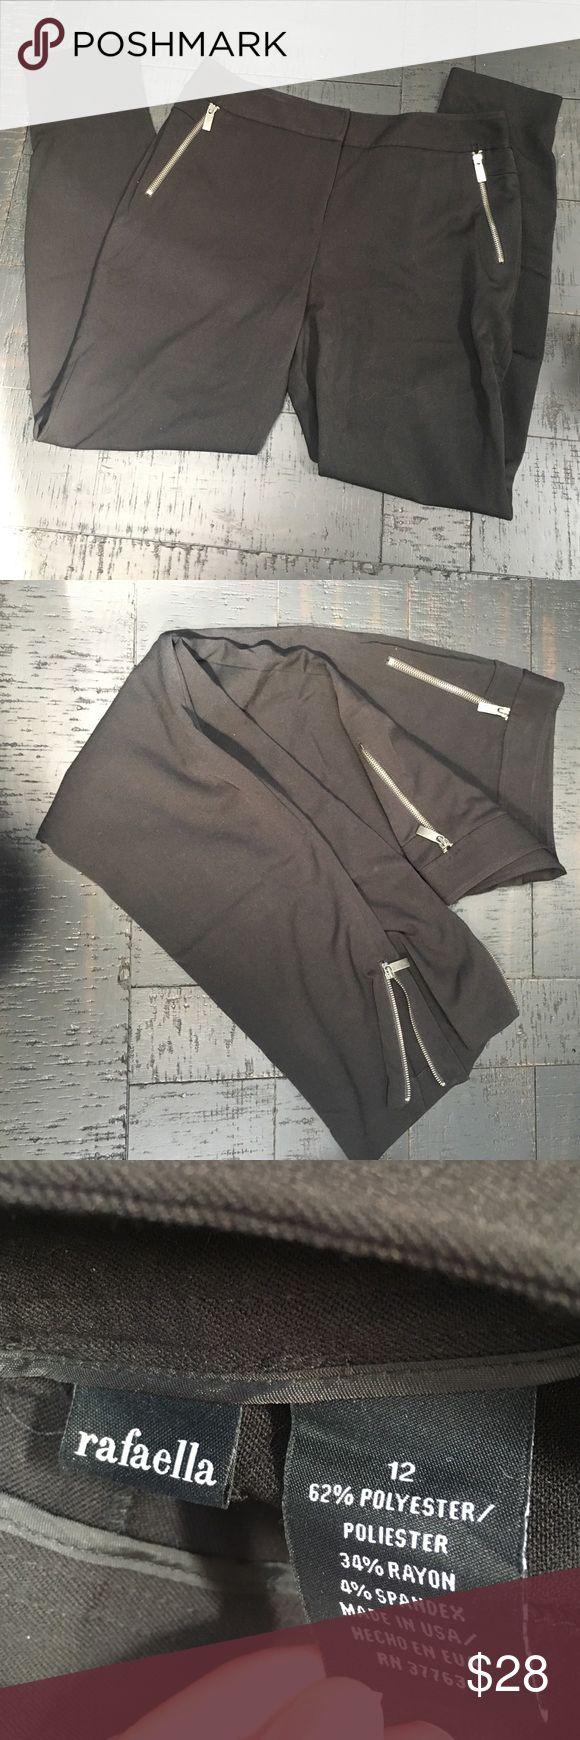 Black pants Black pants with ankle and pocket zipper accents Rafaella Pants